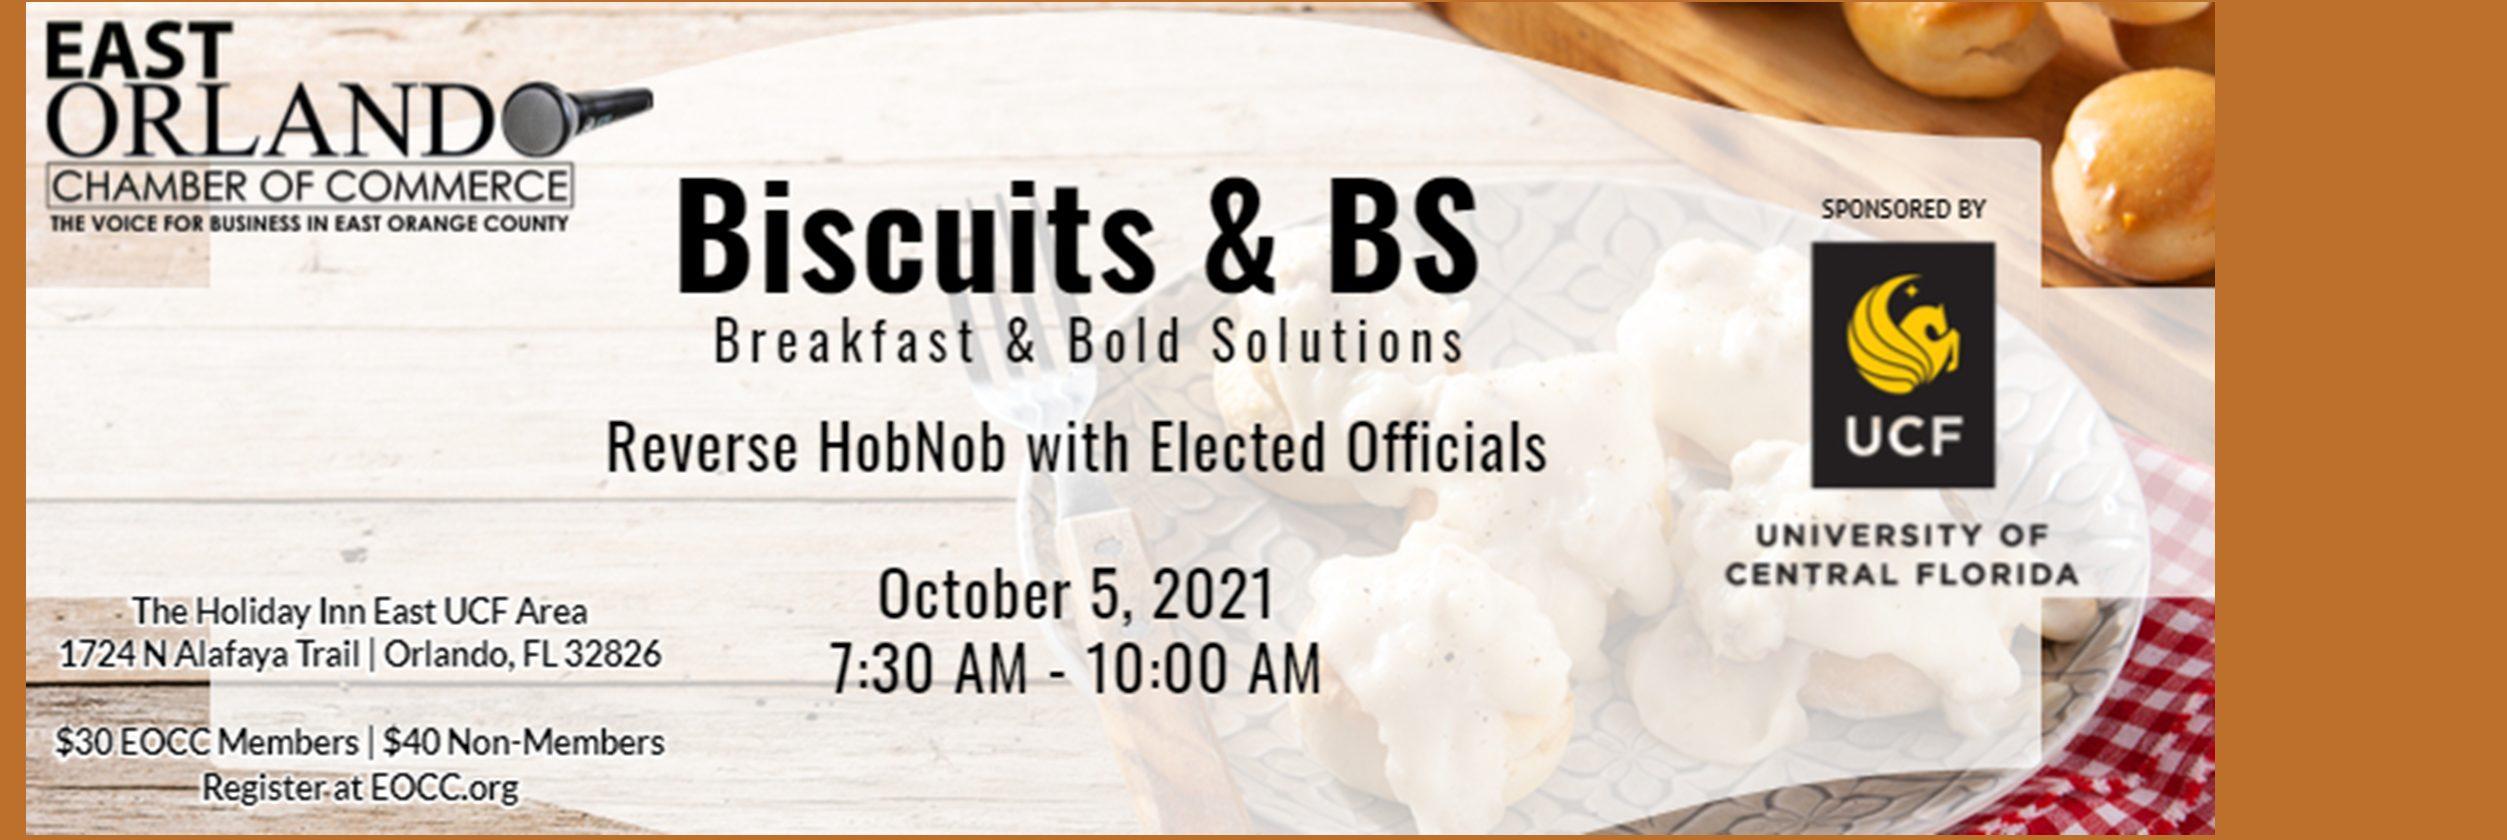 Biscuits & BS 2021